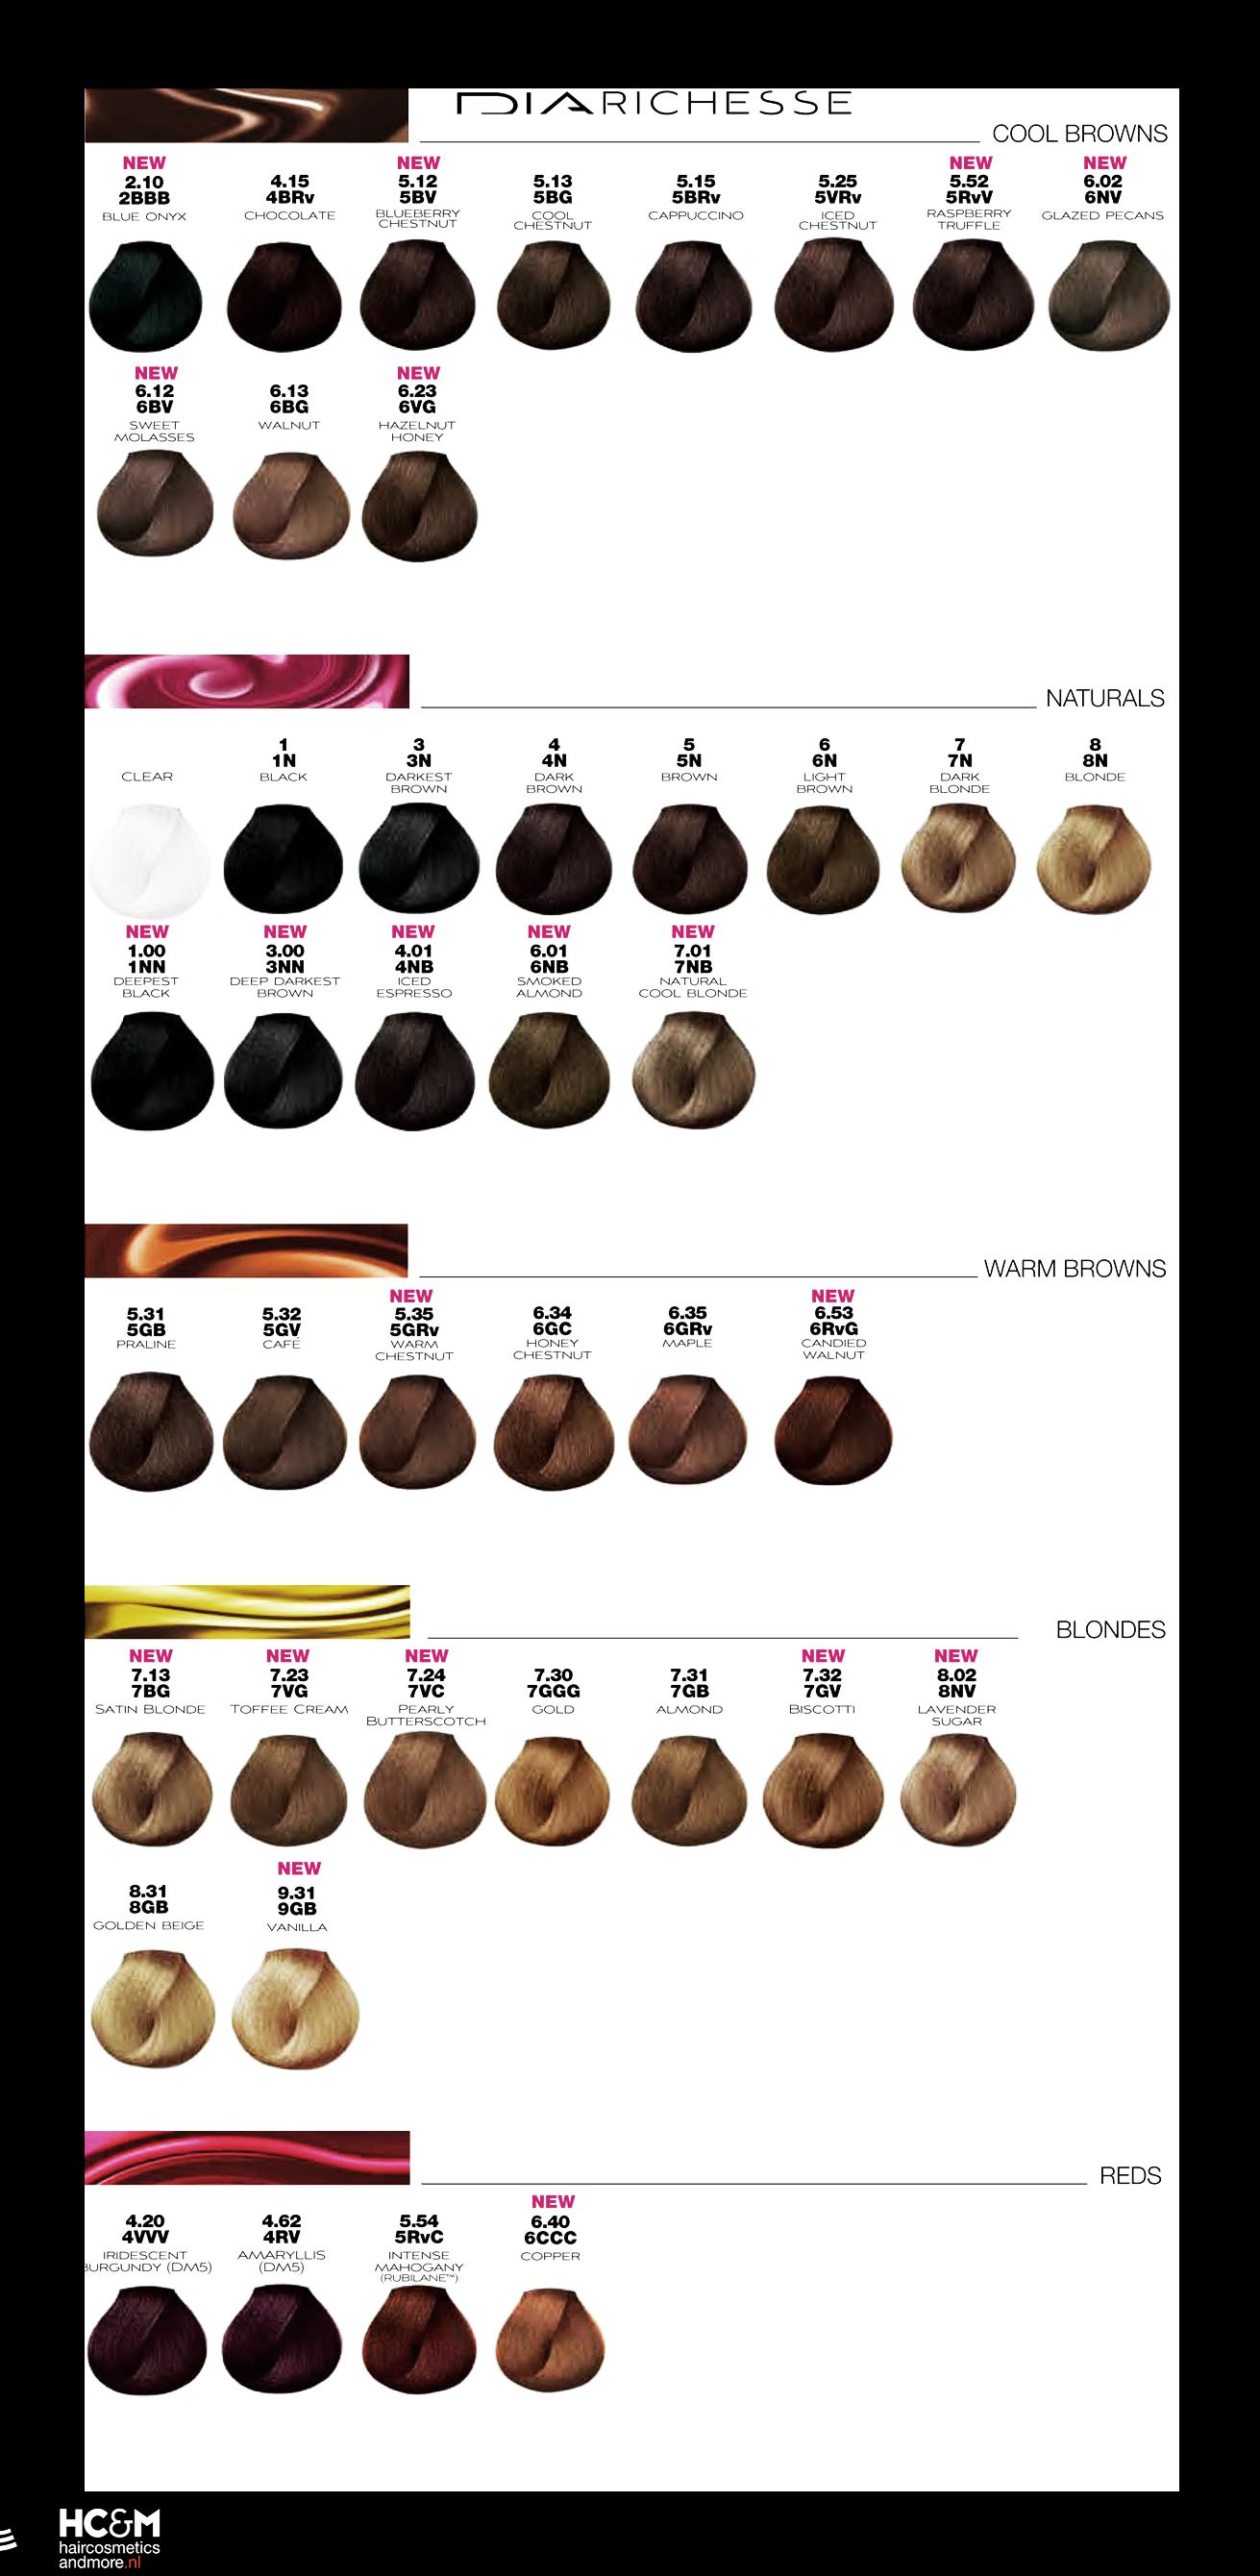 L Oreal Professionnel Dia Richesse Color Chart August 2014 Loreal Hair Color Hair Color Chart Loreal Hair Color Chart